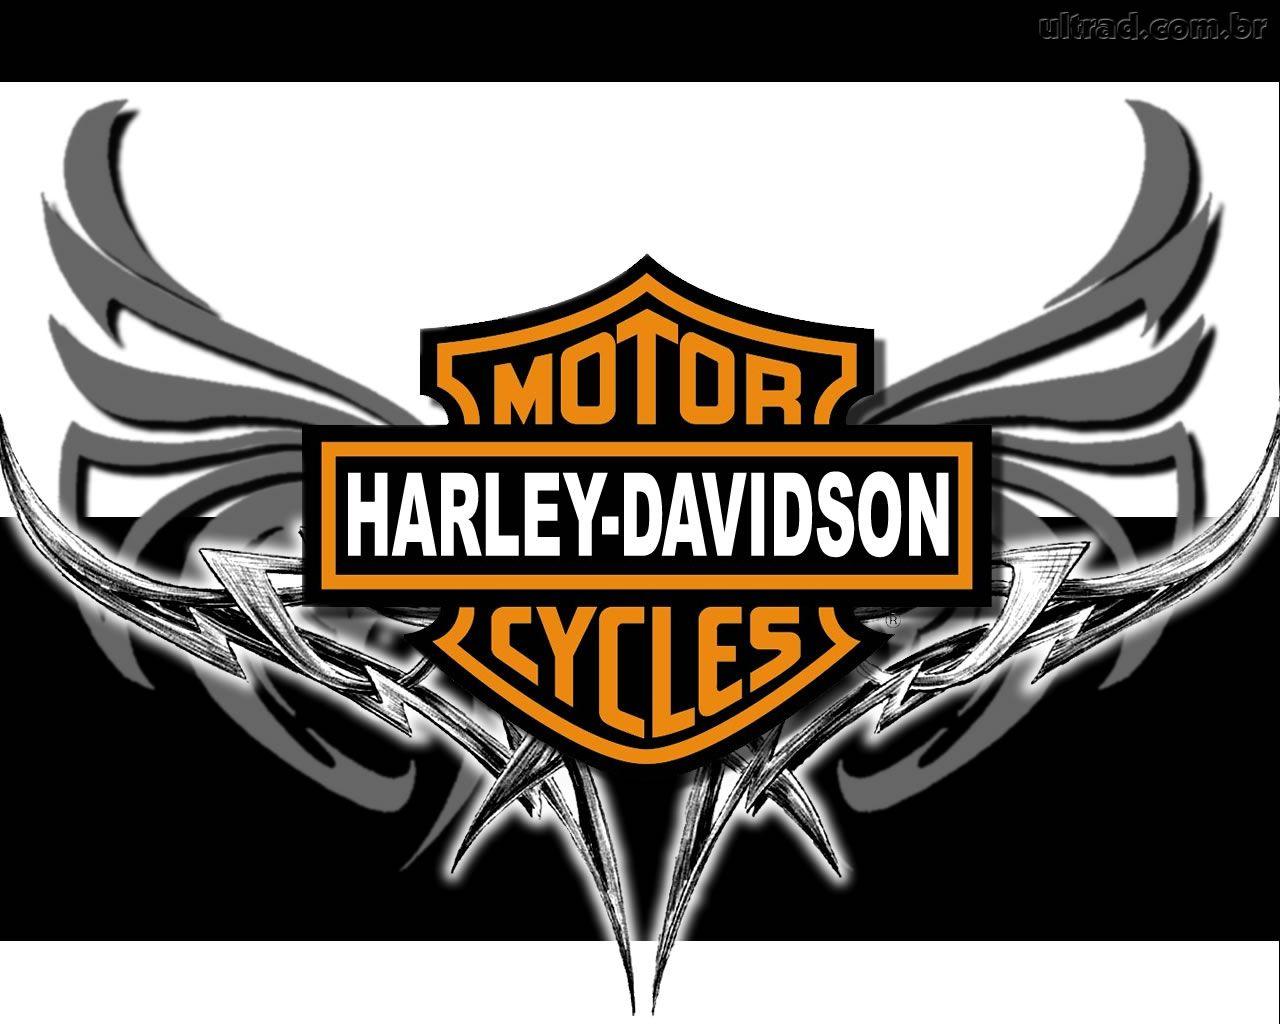 Harley Davidson Wallpapers And Screensavers: [49+] Harley Screensavers And Wallpaper On WallpaperSafari